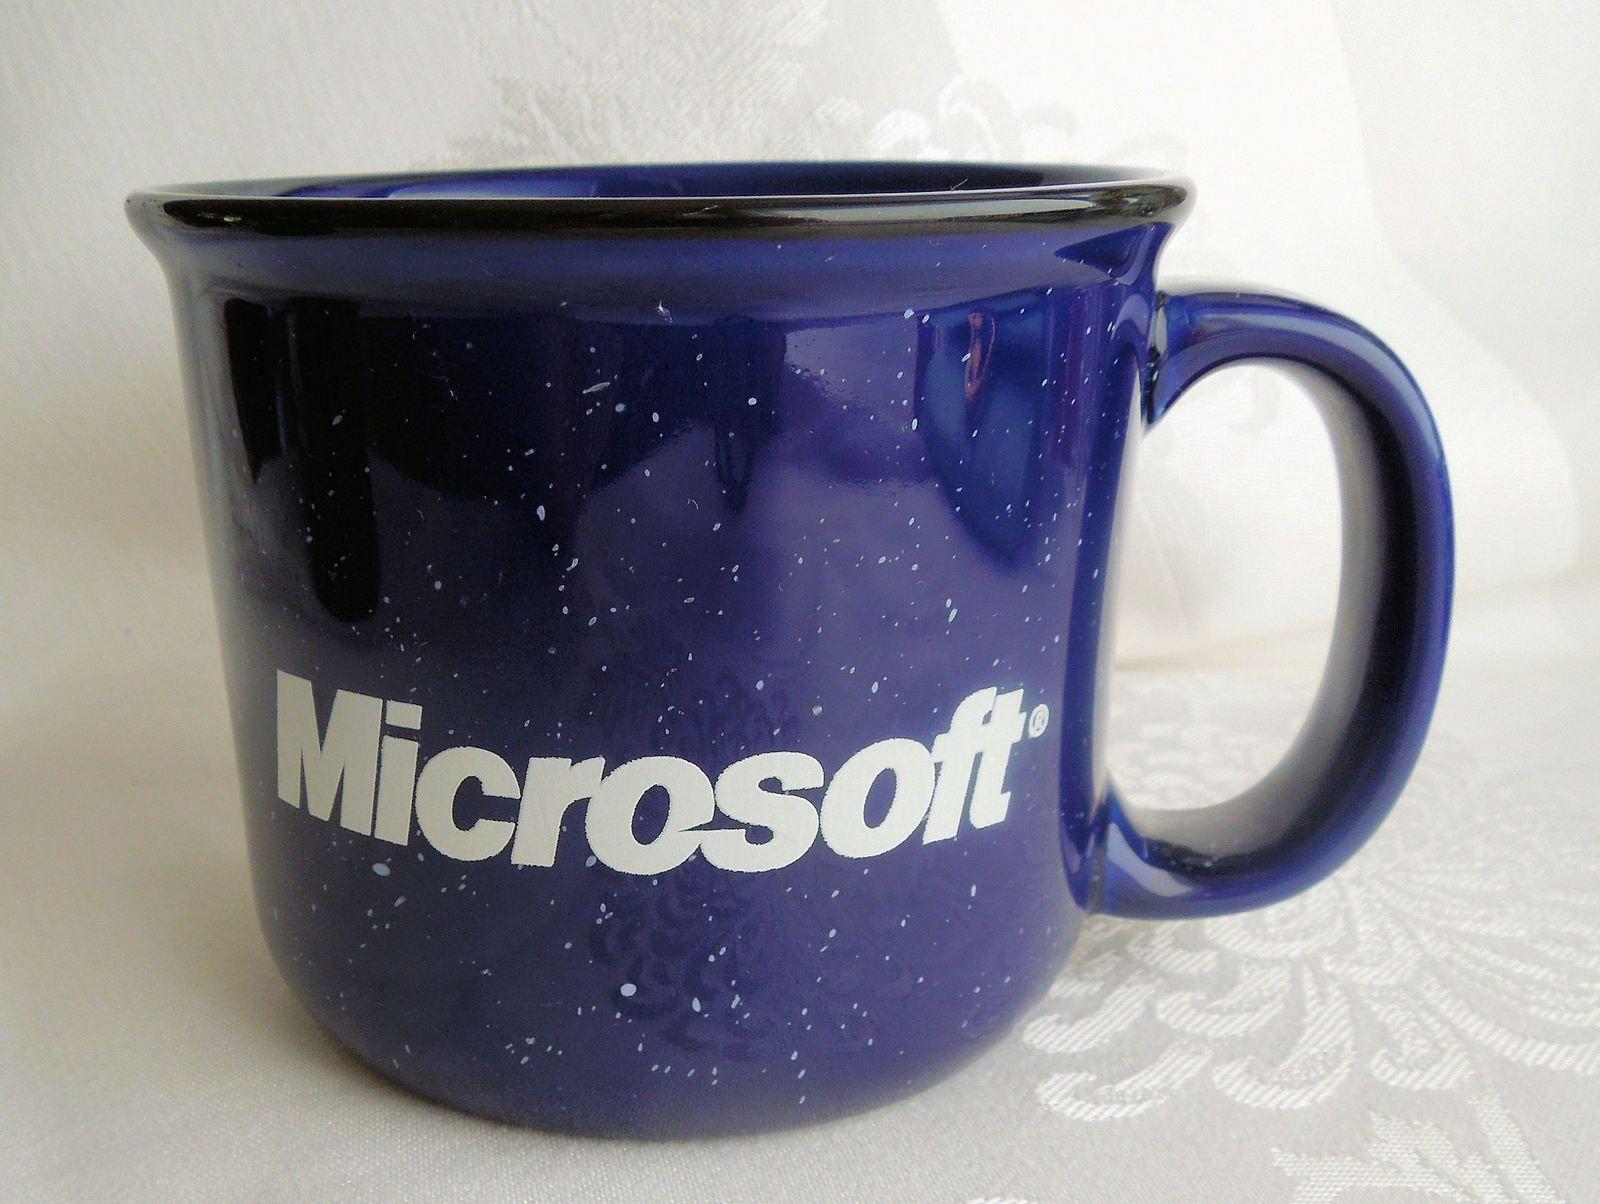 Microsoft Mug Dark Bbue Speckled Heavy Stoneware #kitchenware #homegoods